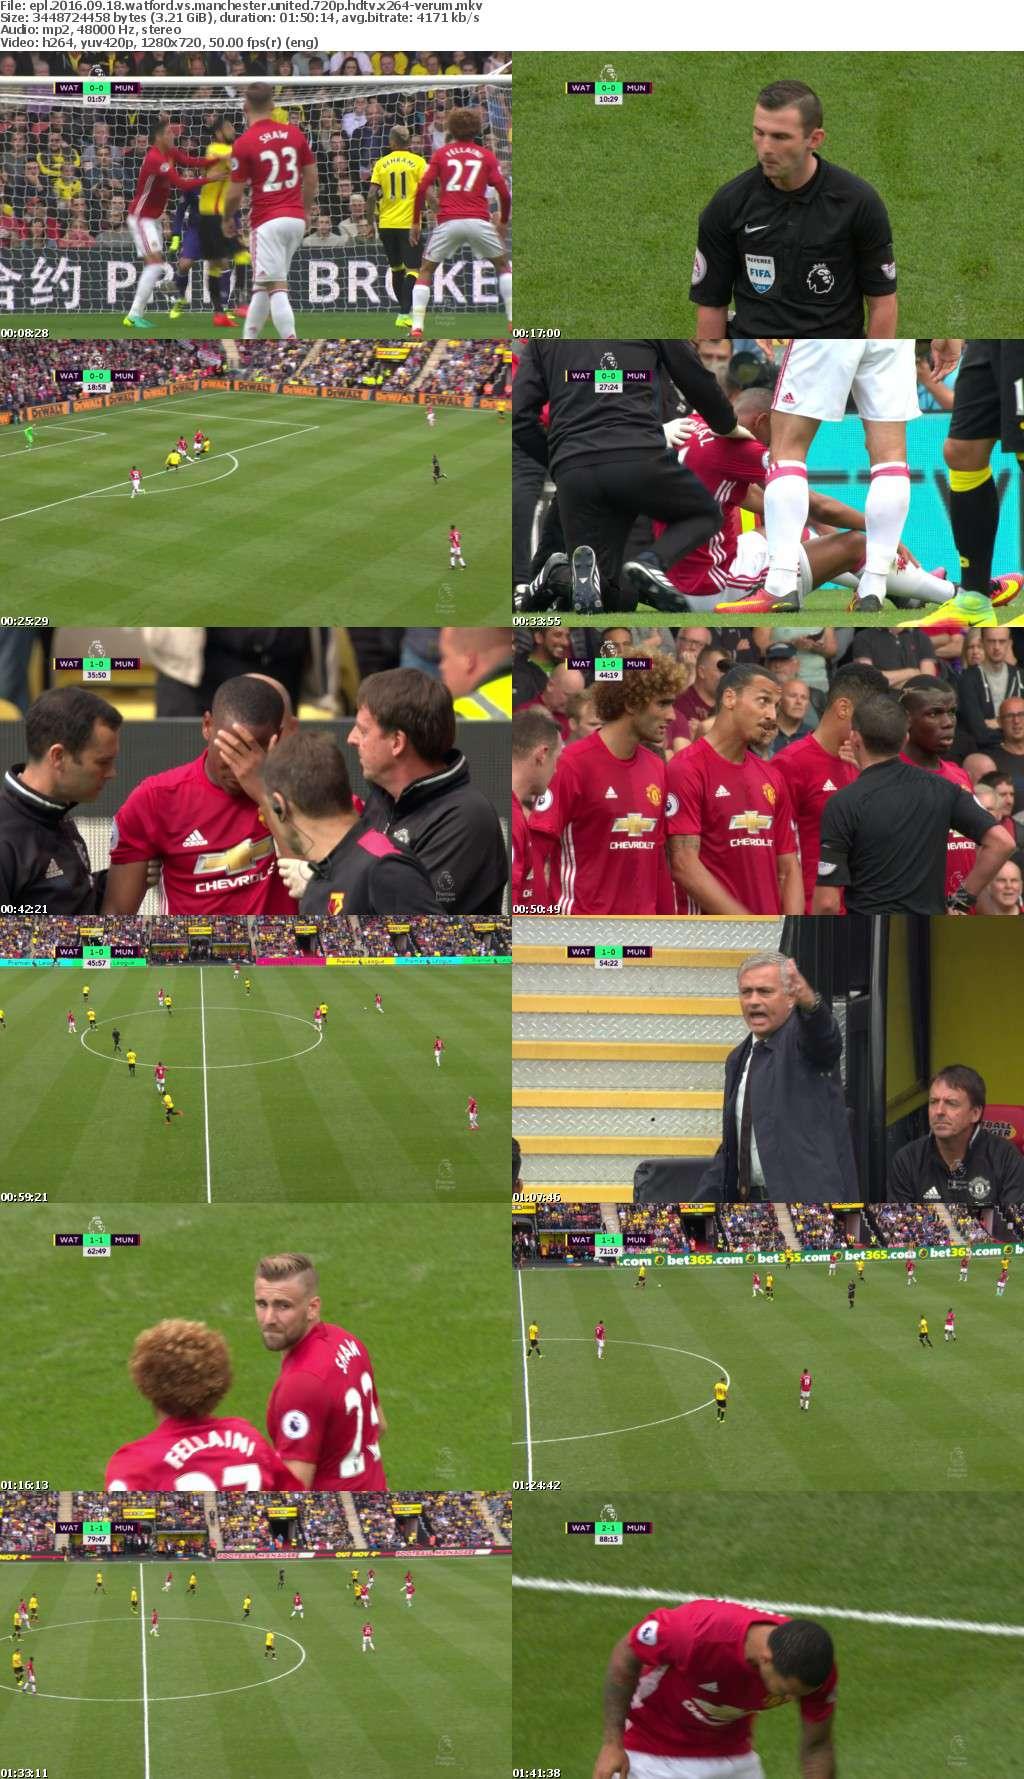 EPL 2016 09 18 Watford vs Manchester United 720p HDTV x264-VERUM